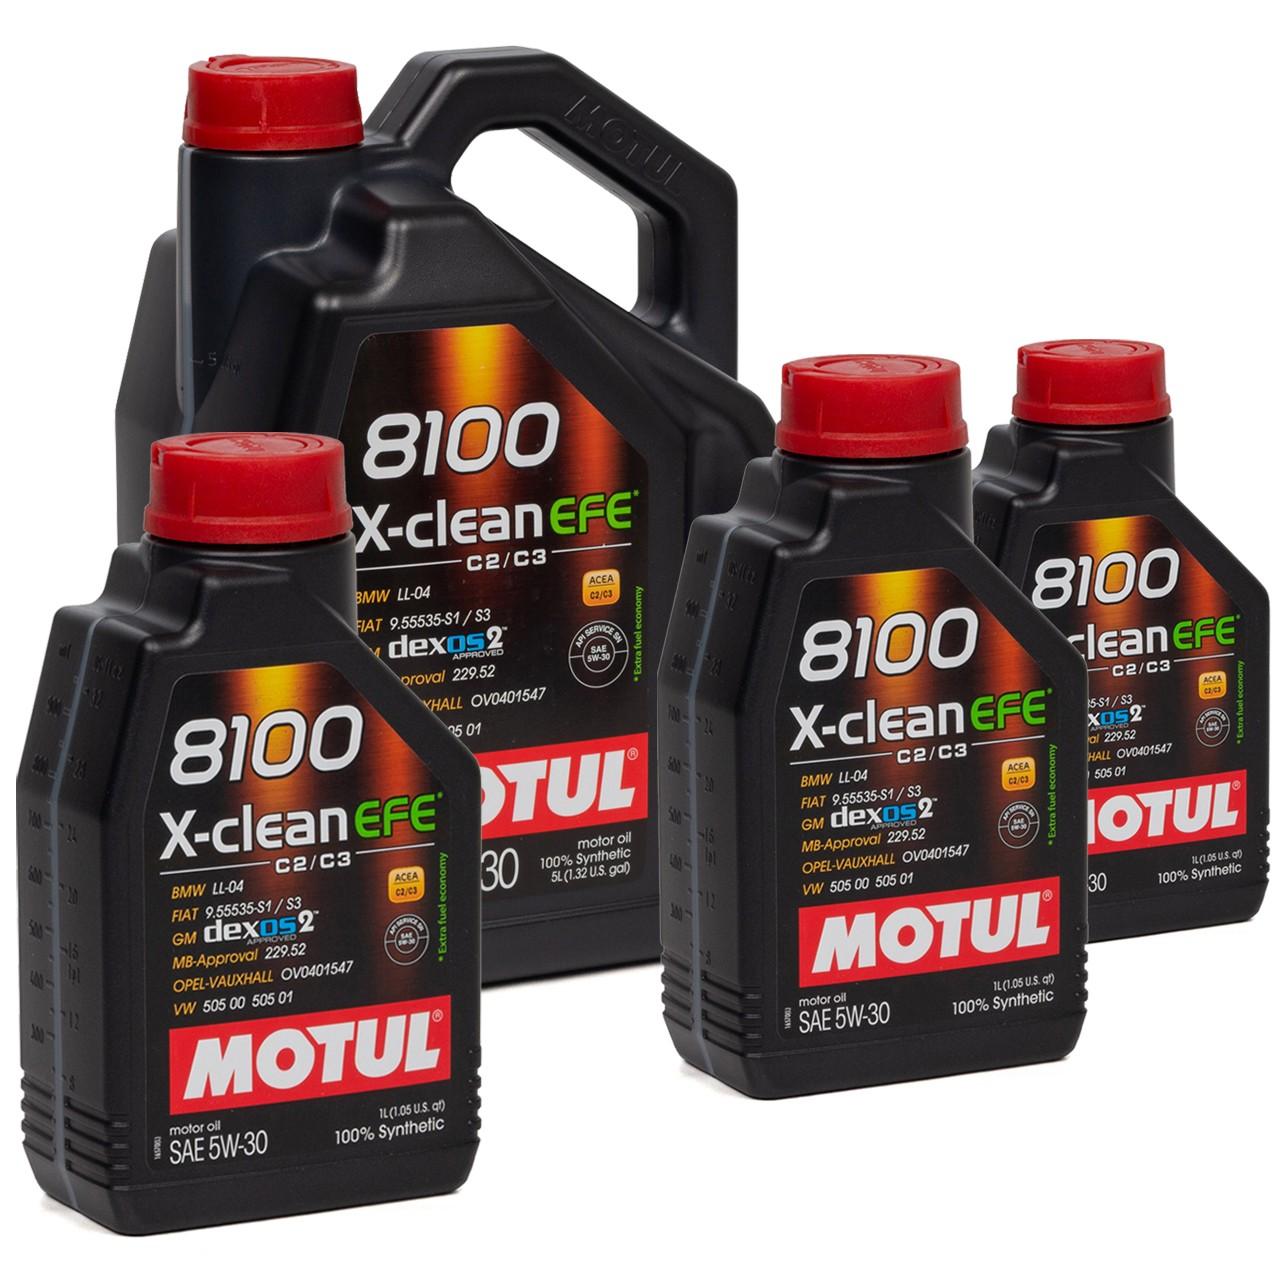 MOTUL 8100 X-Clean EFE Motoröl Öl 5W30 dexos2 VW 505.00/505.01 - 8L 8 Liter